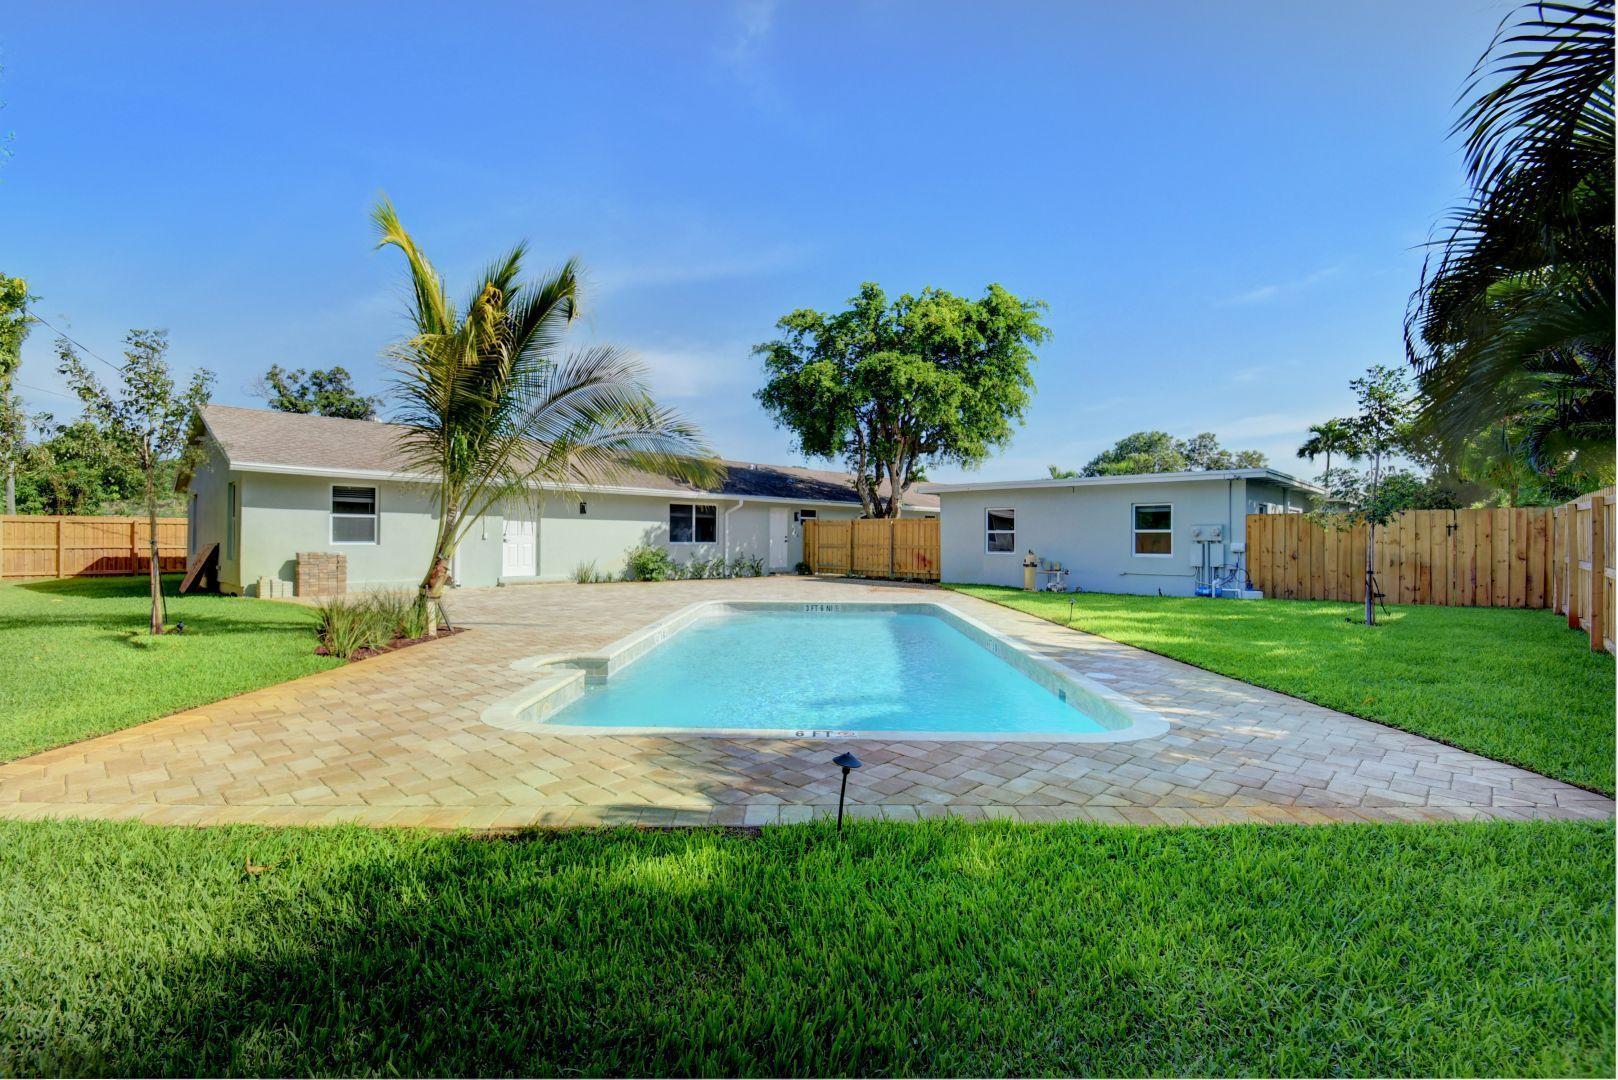 235 NE 13th Street  Delray Beach, FL 33444